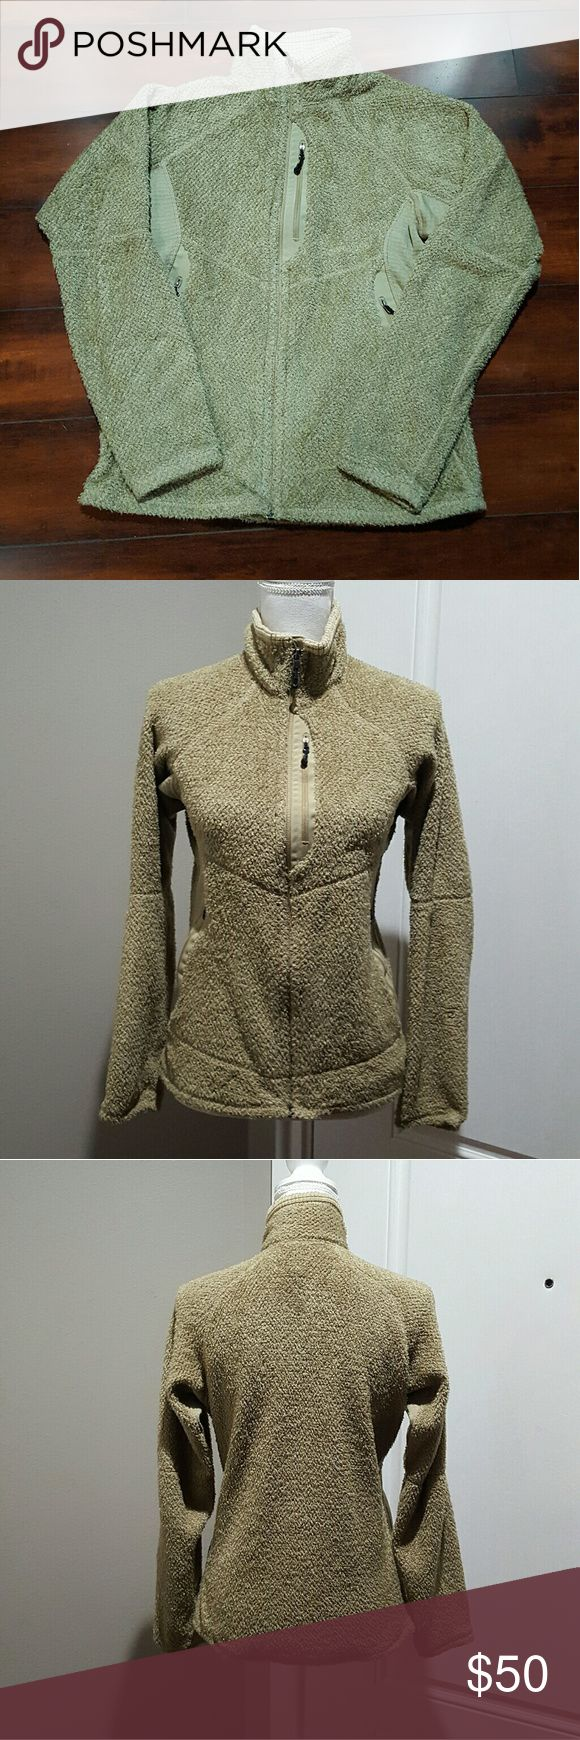 Men's Patagonia fleece jacket, size small Men's Patagonia fleece jacket, size small. No stains or tares. Tan colored. Patagonia Jackets & Coats